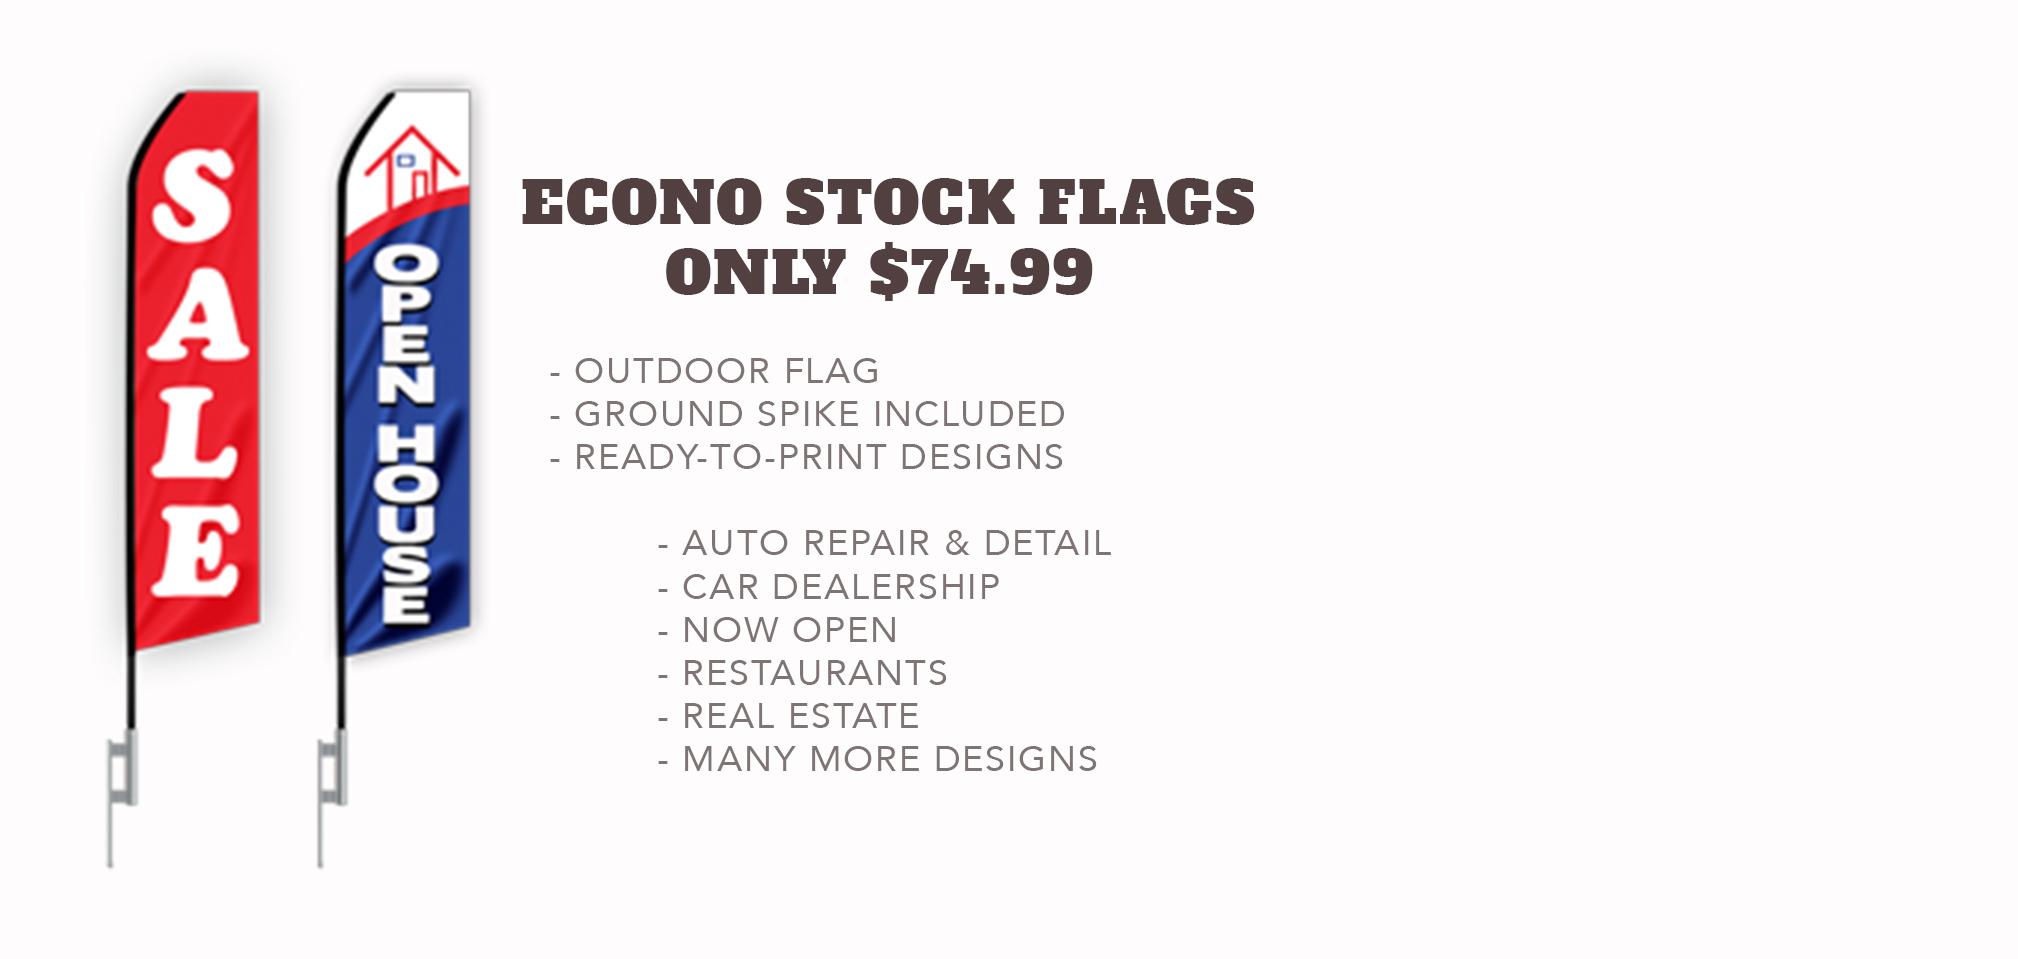 Econo Stock Flag - Only $74.99